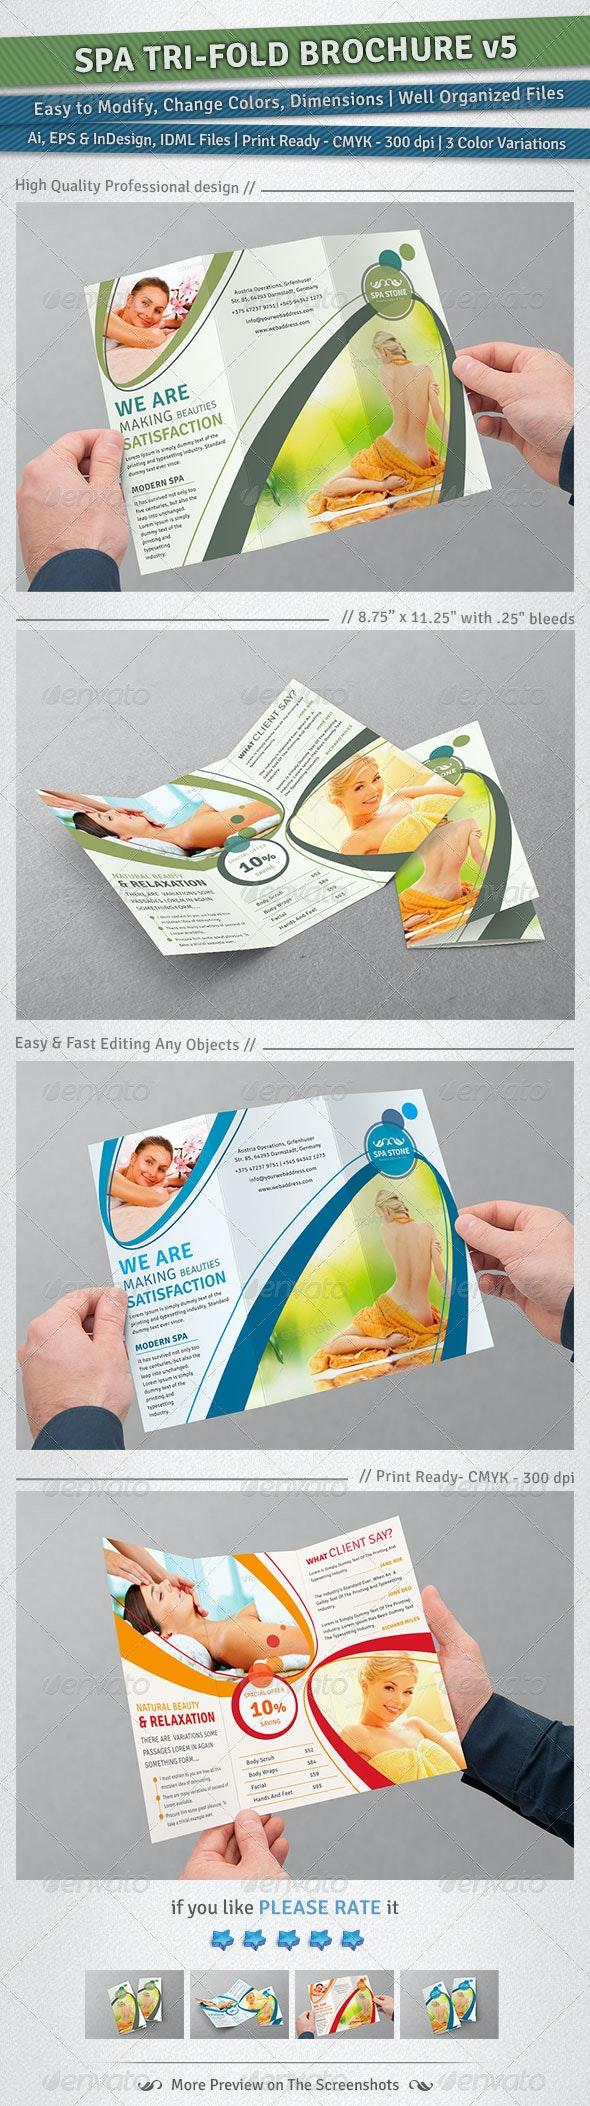 Spa Tri-Fold Brochure | Volume 5 - Corporate Brochures